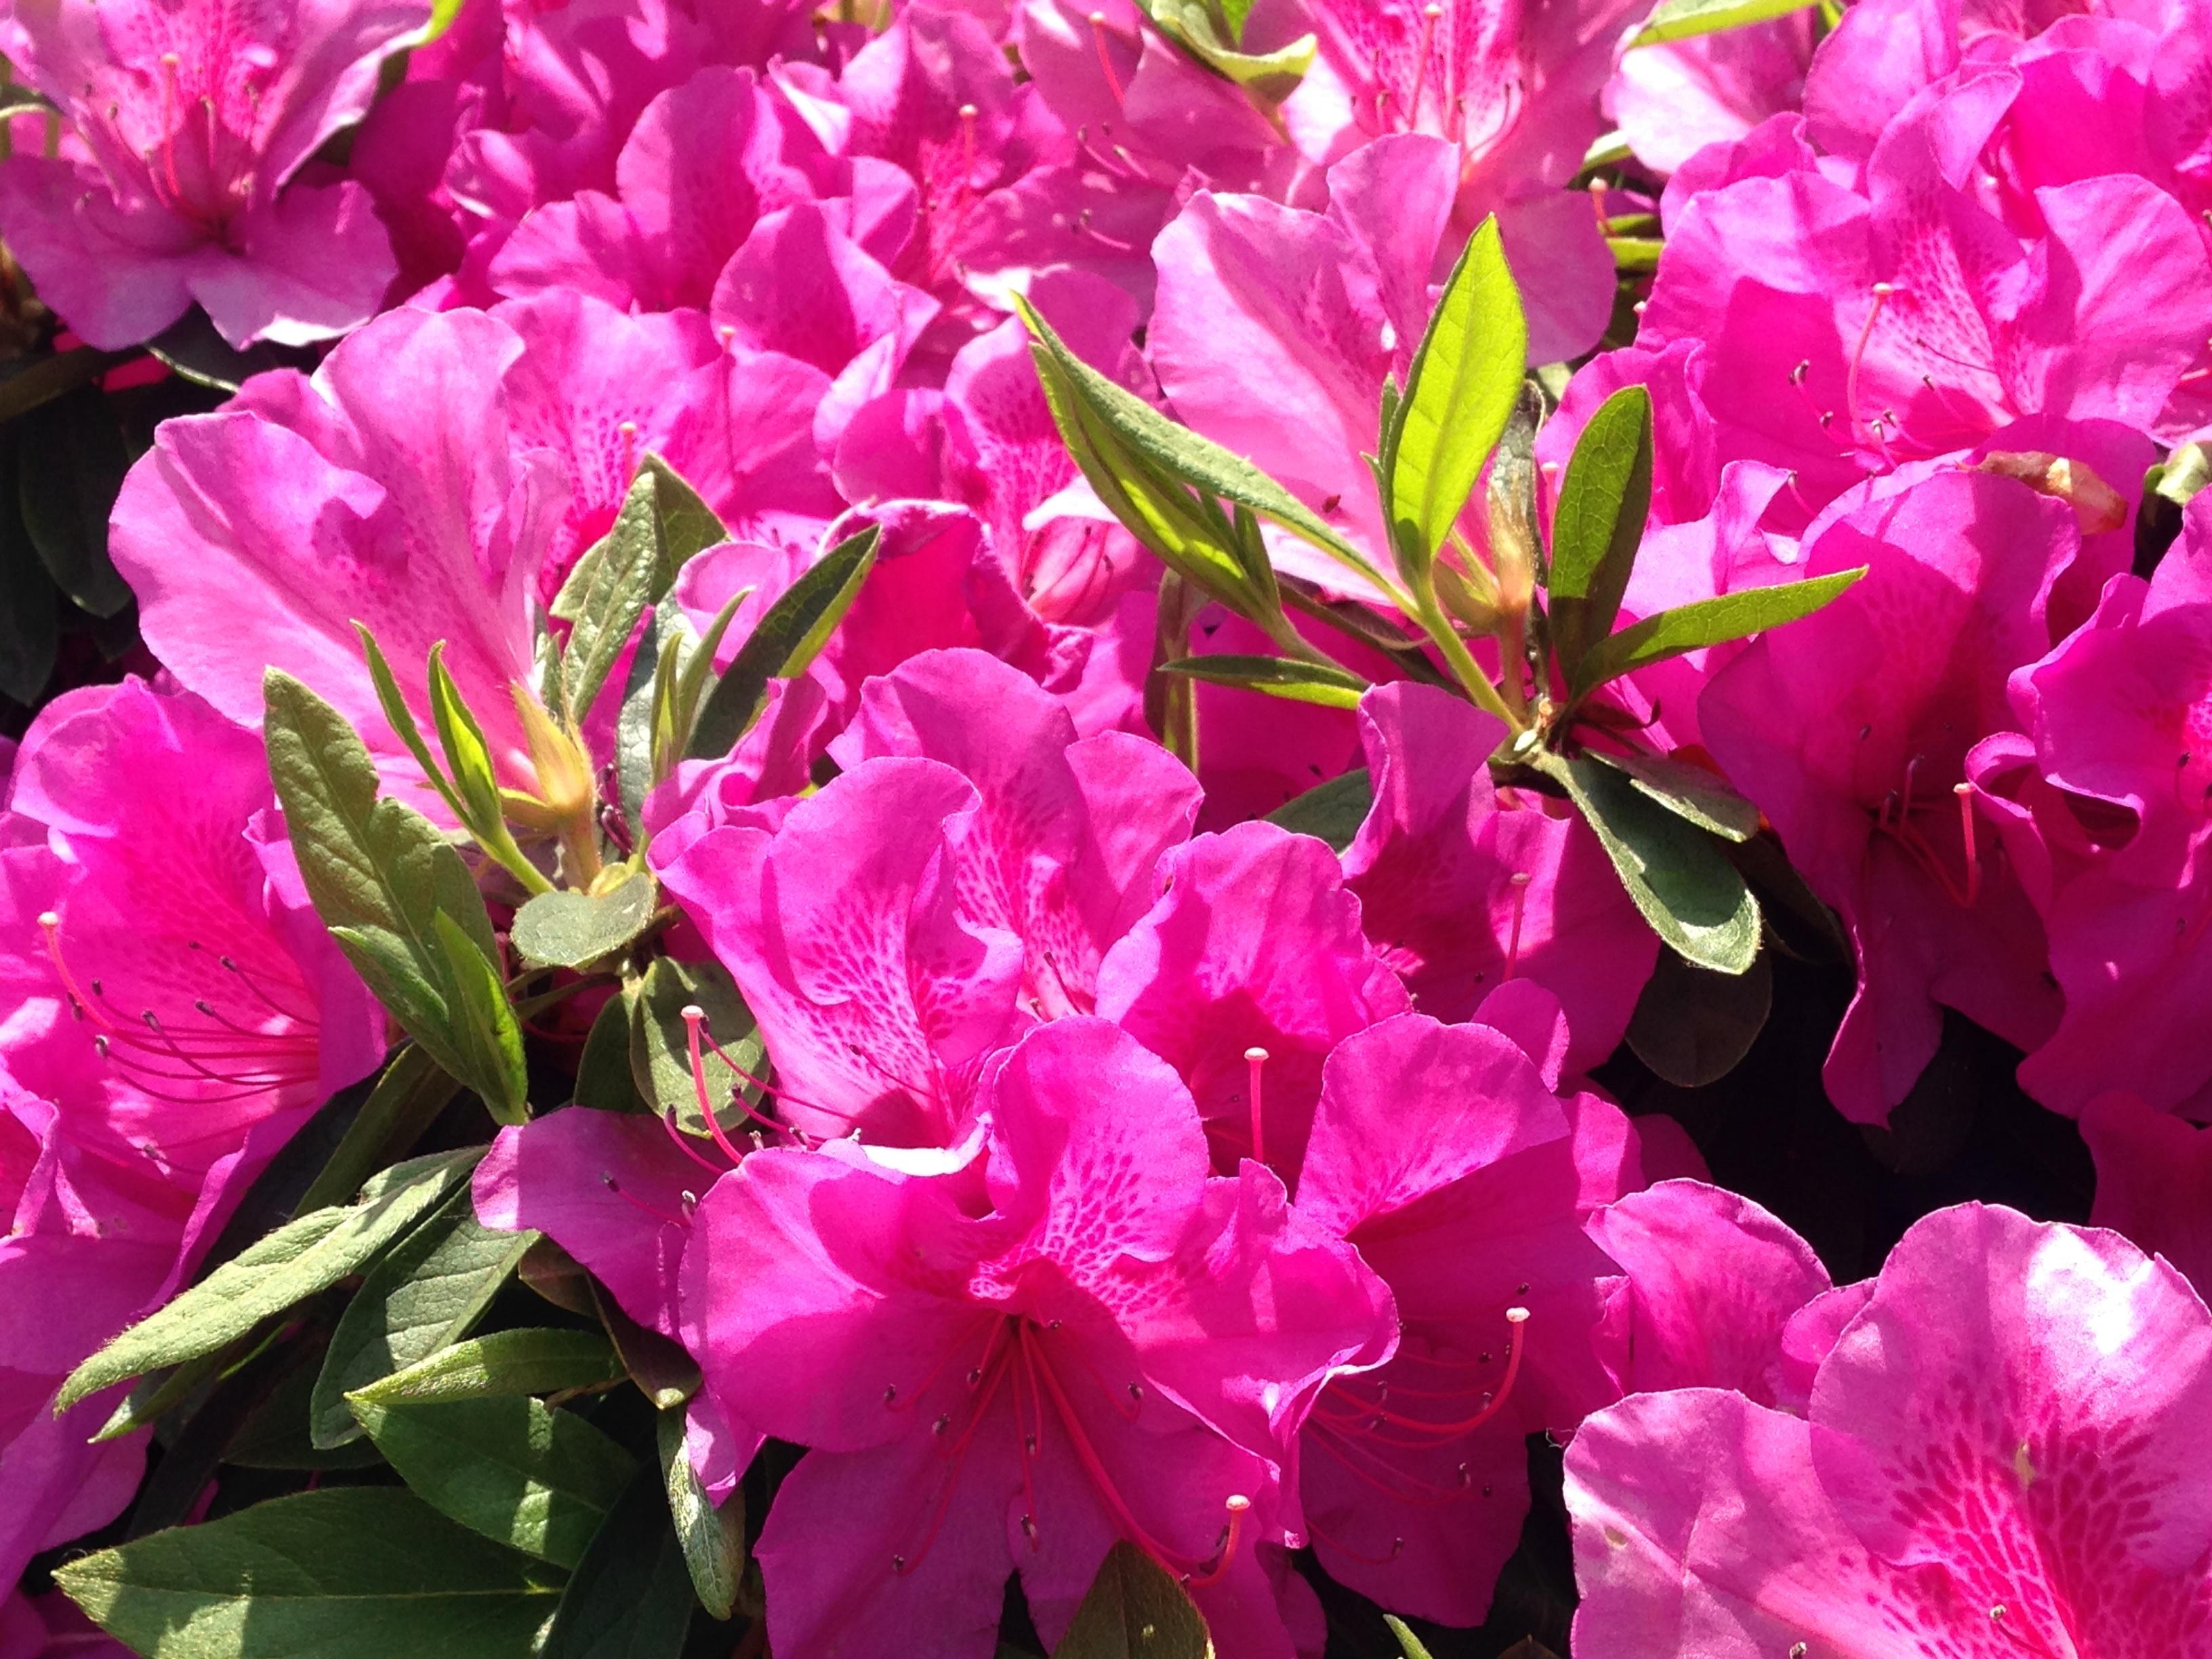 панорамы цветок азалия картинка сари индии